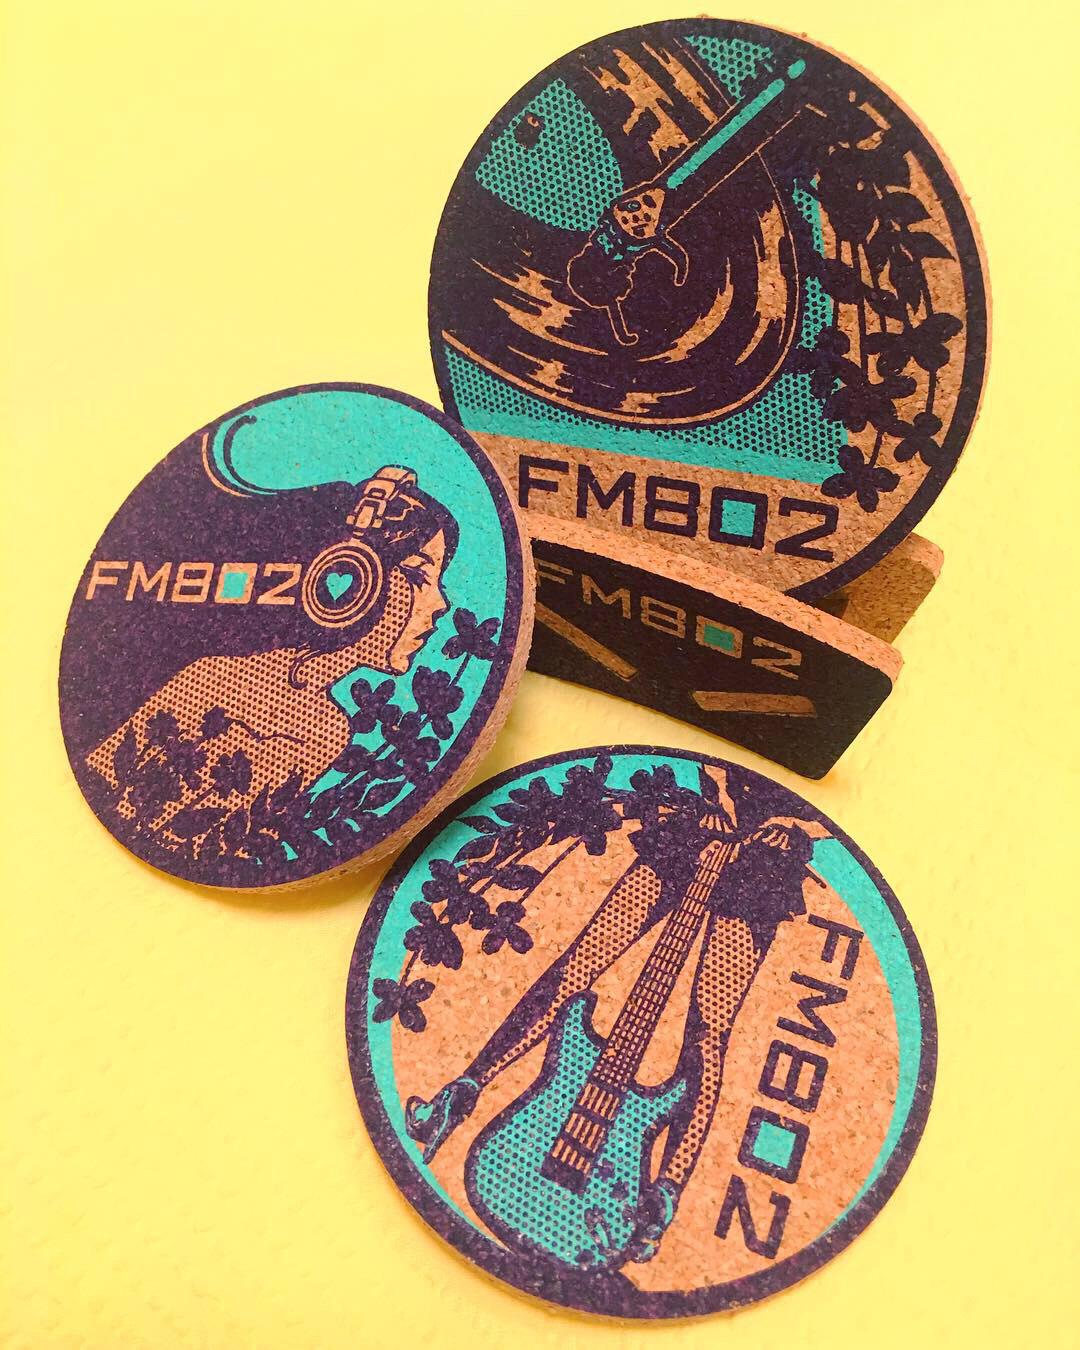 FM802 Cork Coasters